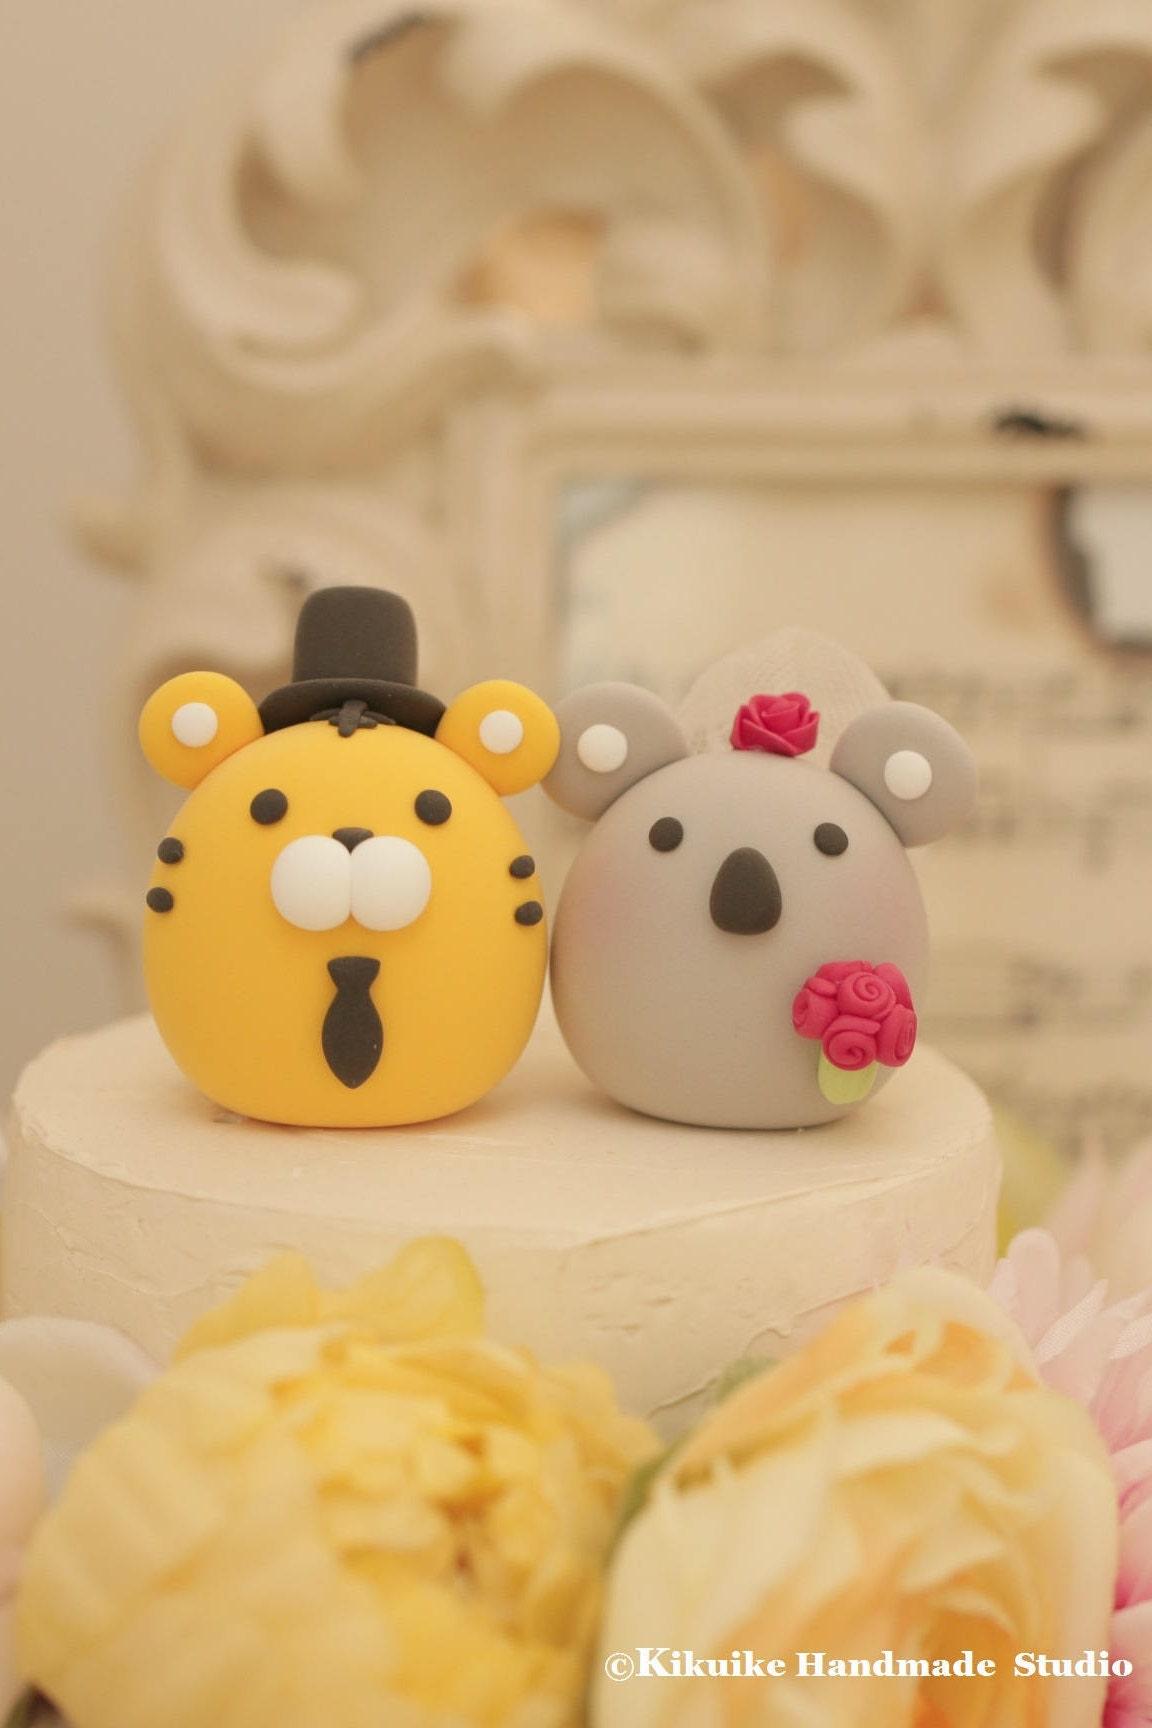 tiger and koala wedding cake topper [E10261624442508539M] - $43.99 ...